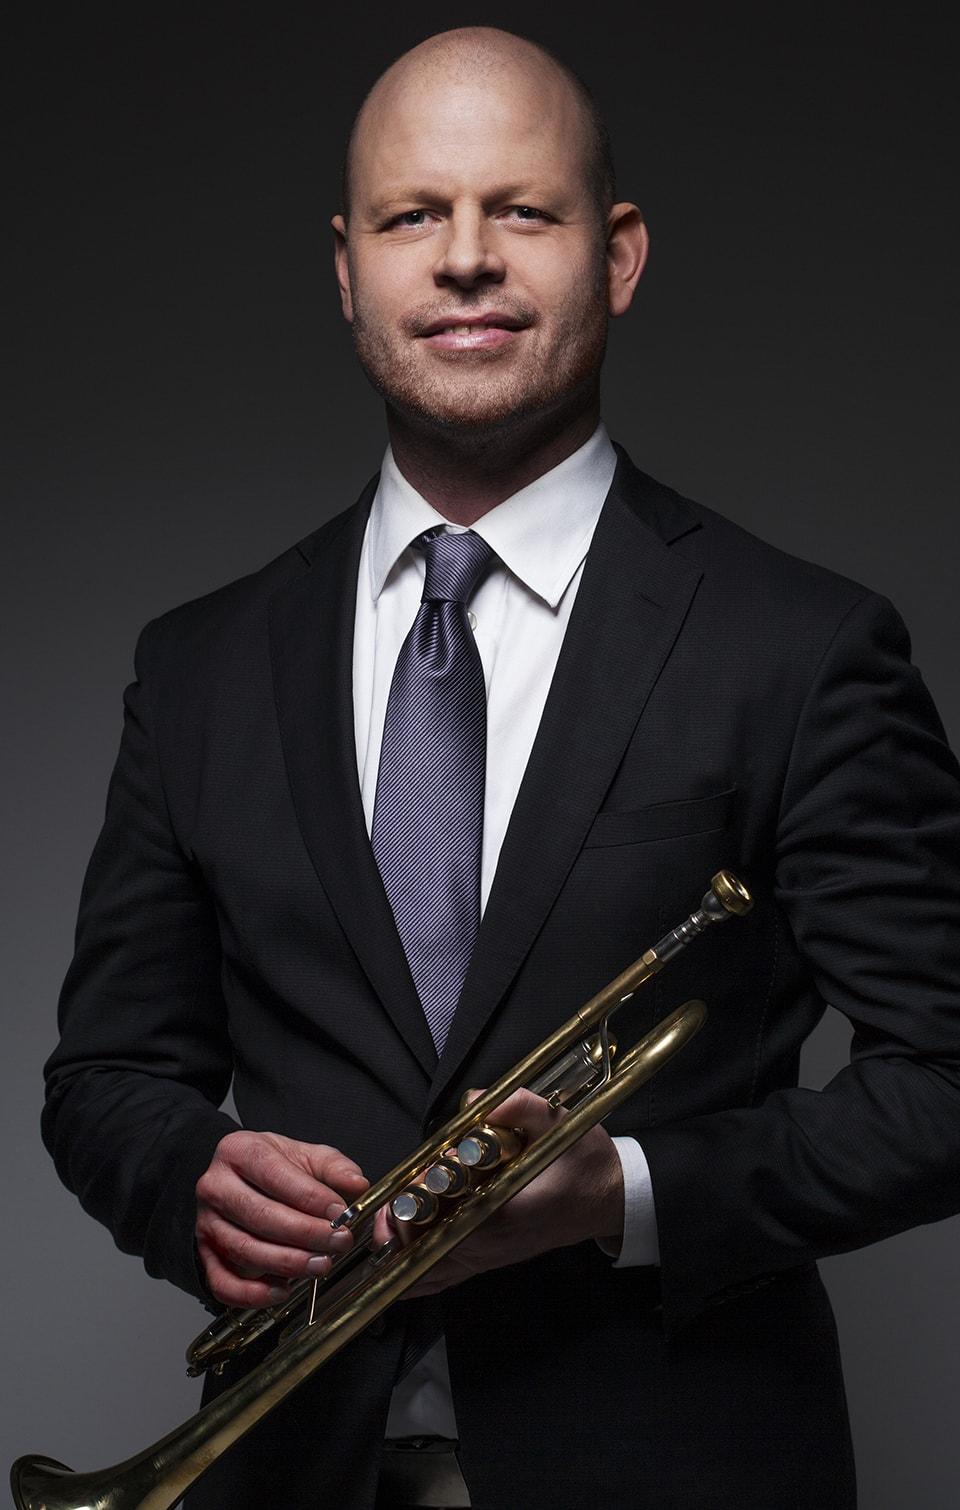 Ulrik Höglund, trumpet (vik.)